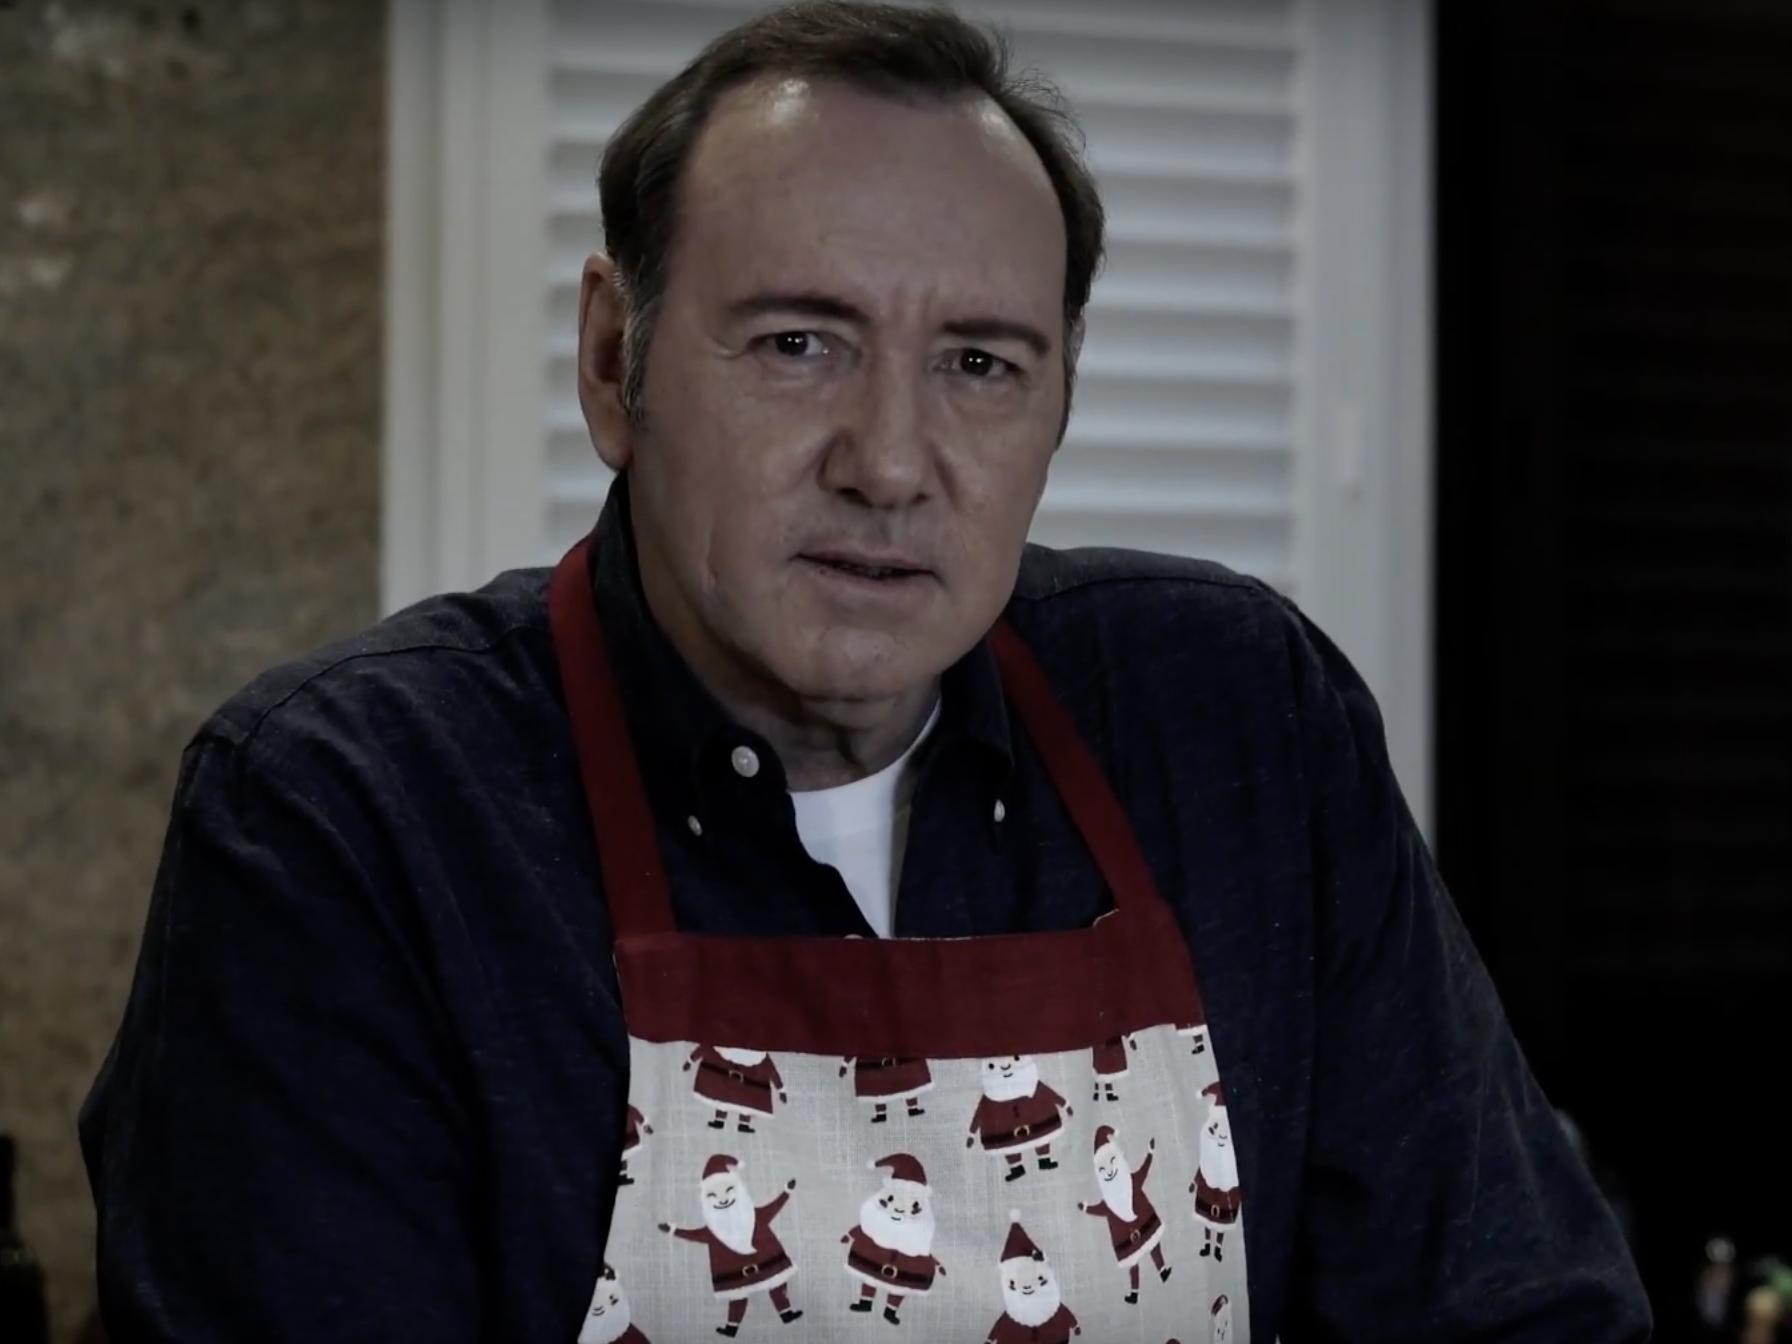 Kevin Spacey releases 'creepy' video as Frank Underwood sparking widespread bewilderment